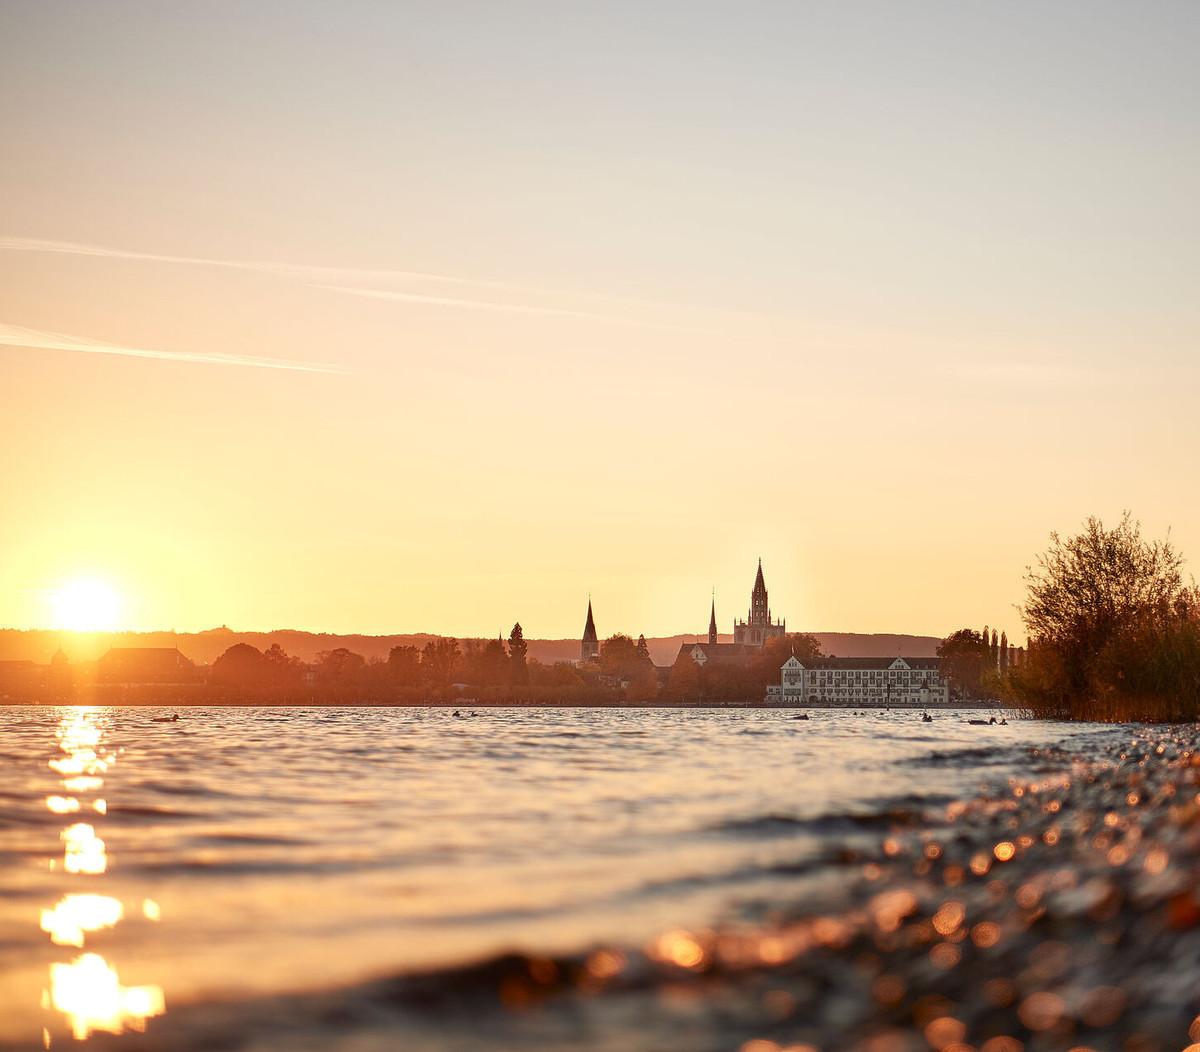 Konstanz-Seeuferweg-Bodensee-Ufer-Segelboot-Sonnenuntergang-Querformat_Herbst-02_Copyright_MTK-Hari-Pulko